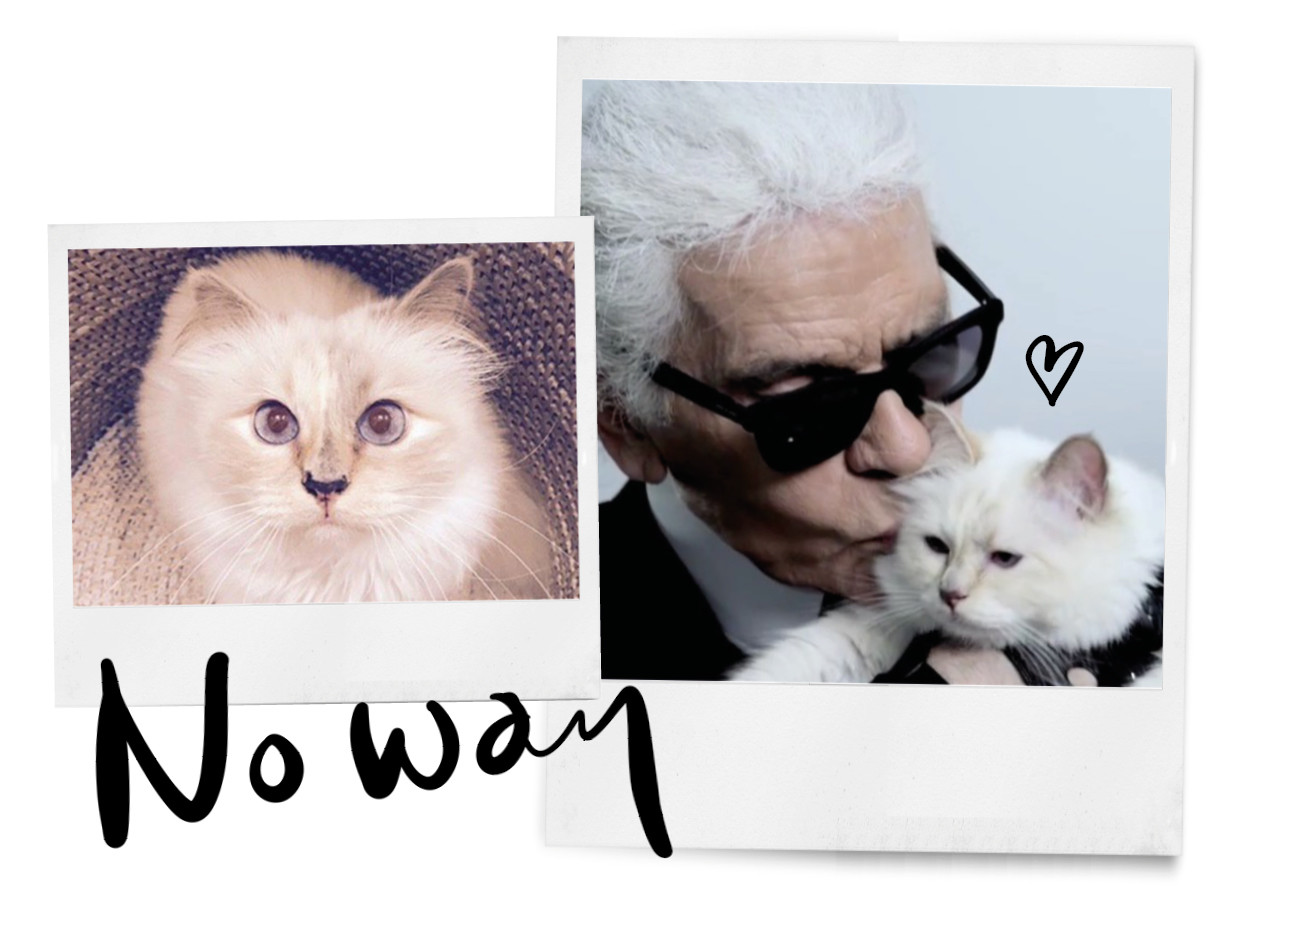 de kat van karl lagerfeld choupette, zonnebril, kiss